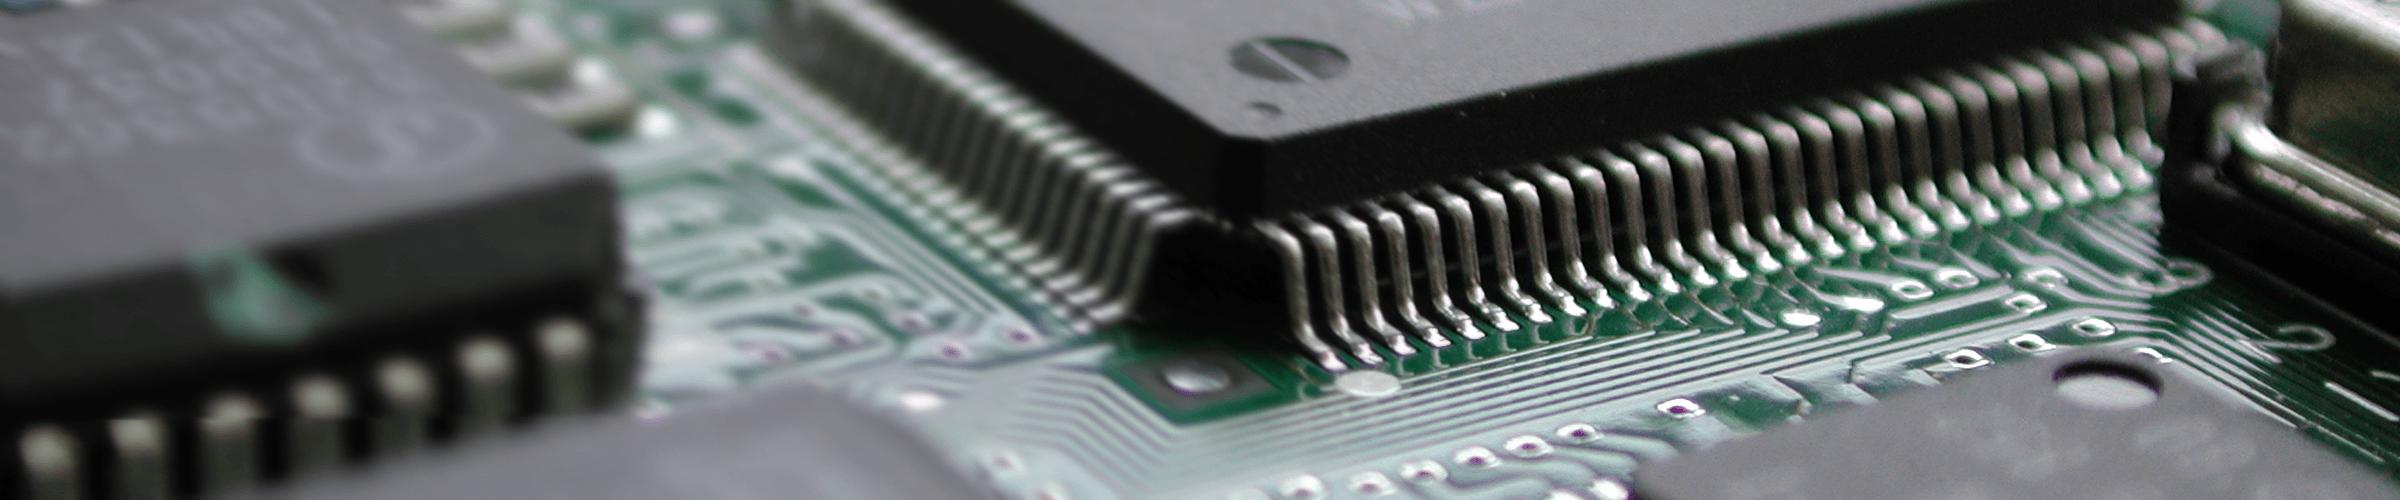 SystemAnalyzer